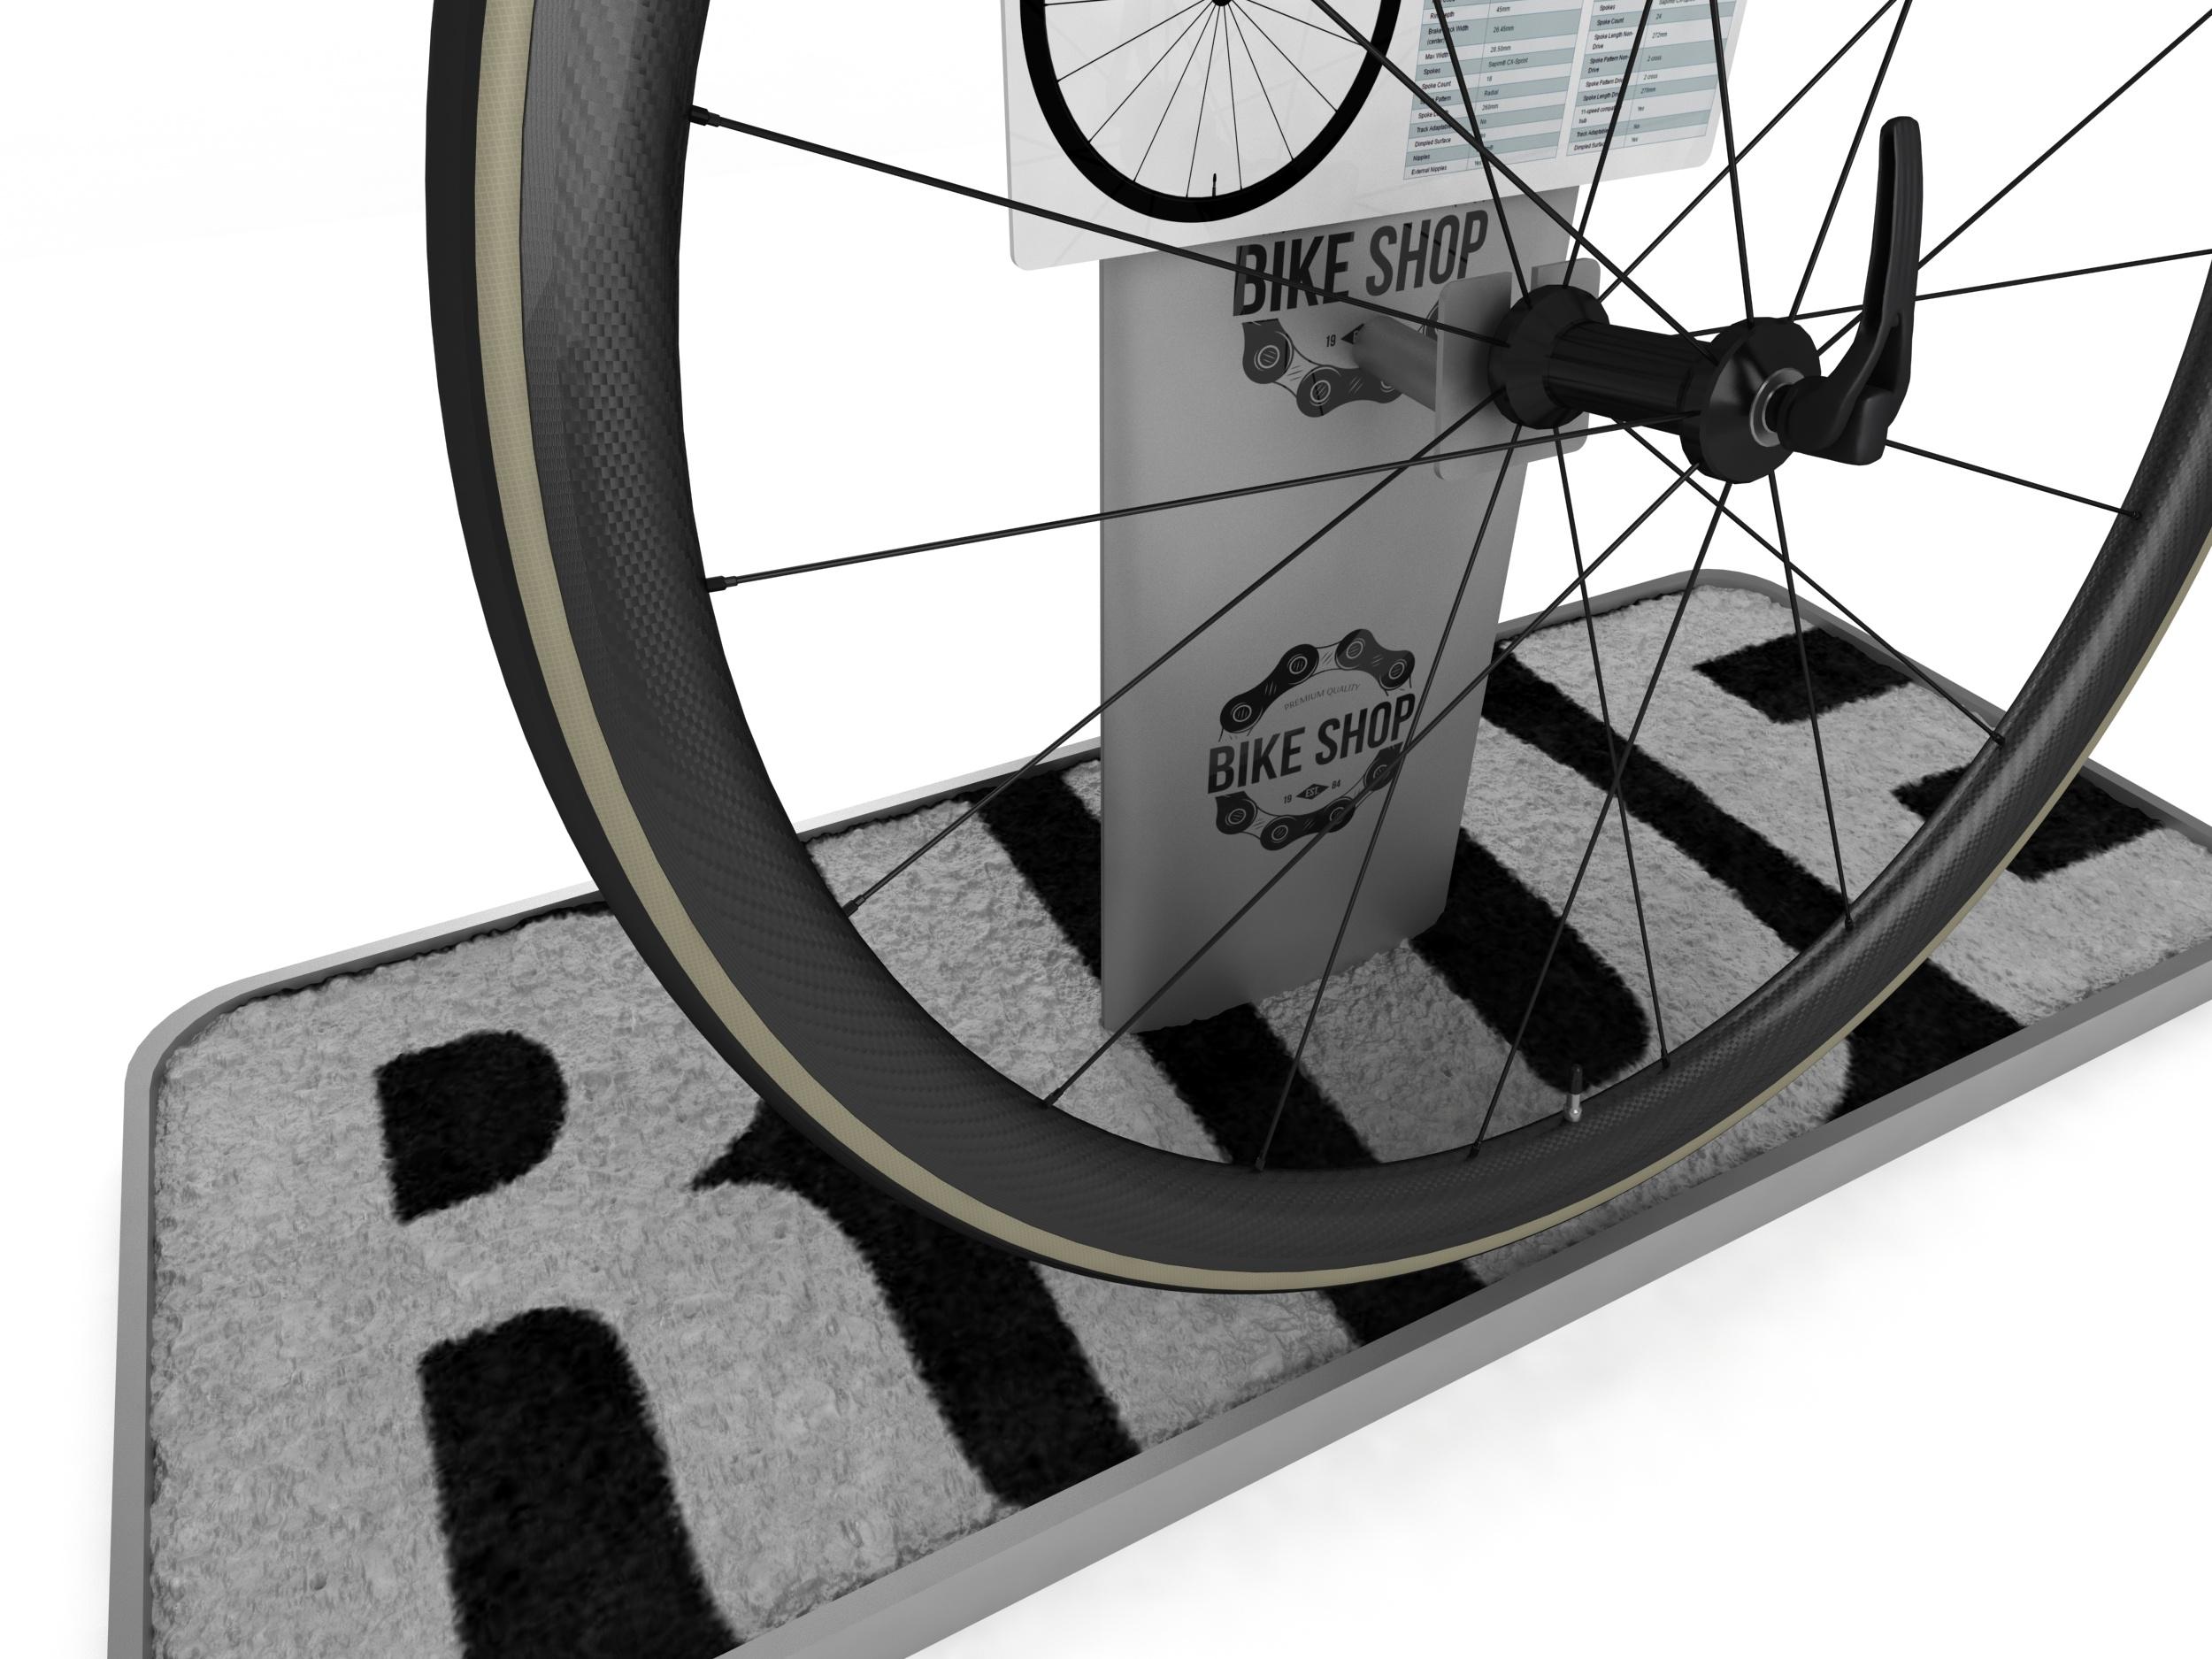 POS_Road Wheel Stand_004.jpg